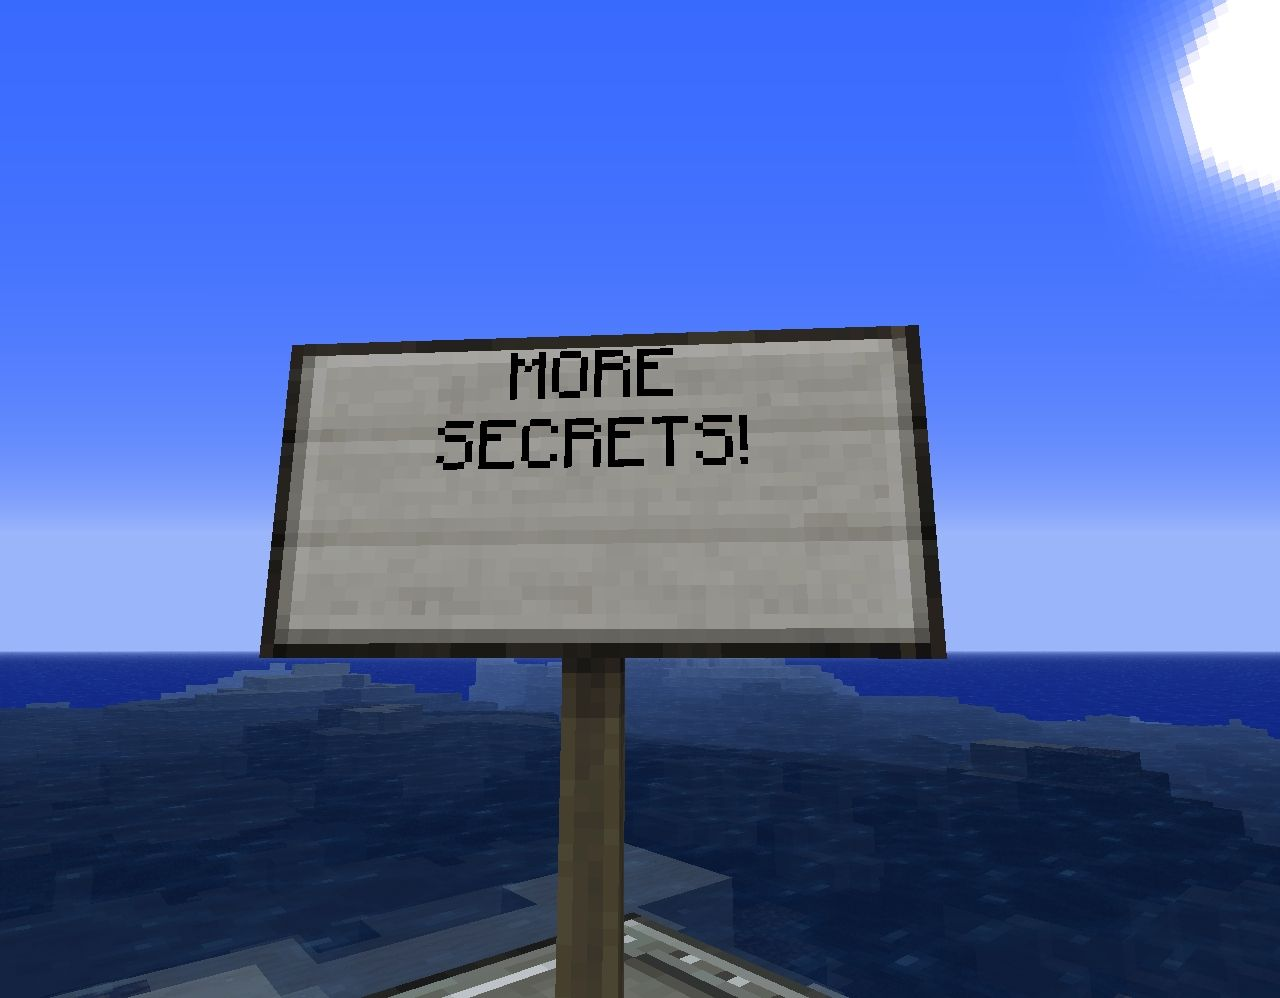 MORE SECRETS